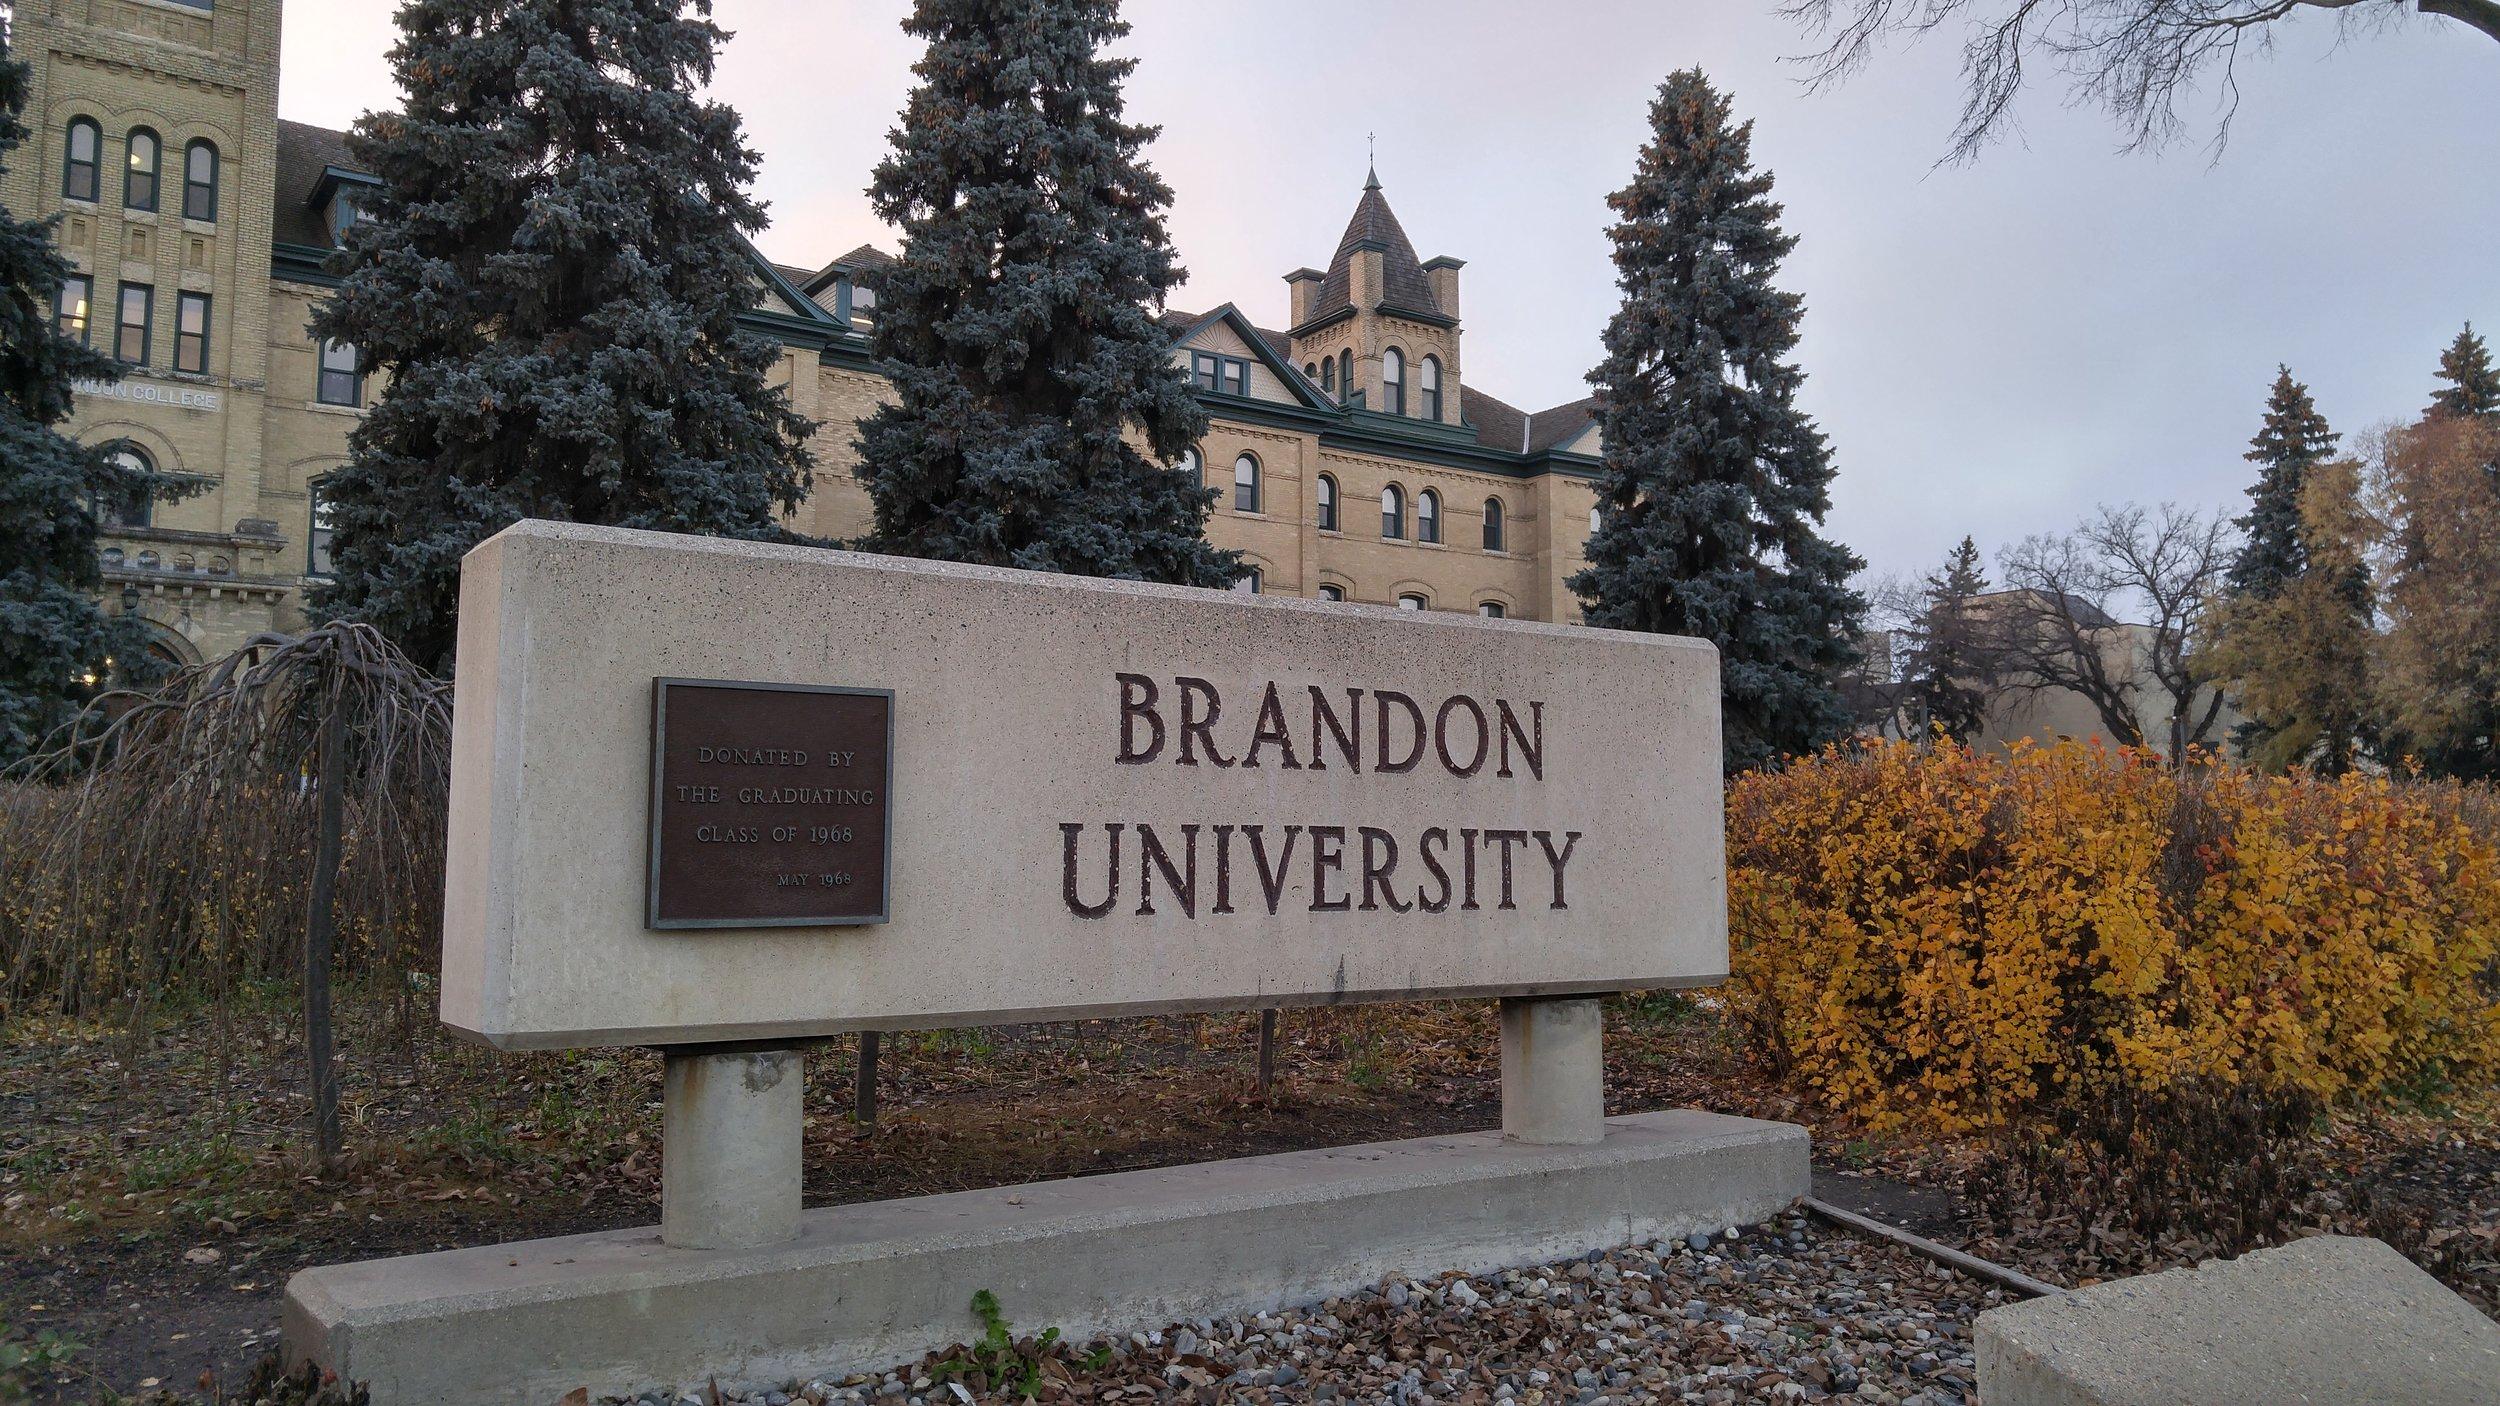 The Brandon University sign in front of Clark Hall. (Logan Praznik/The Quill)